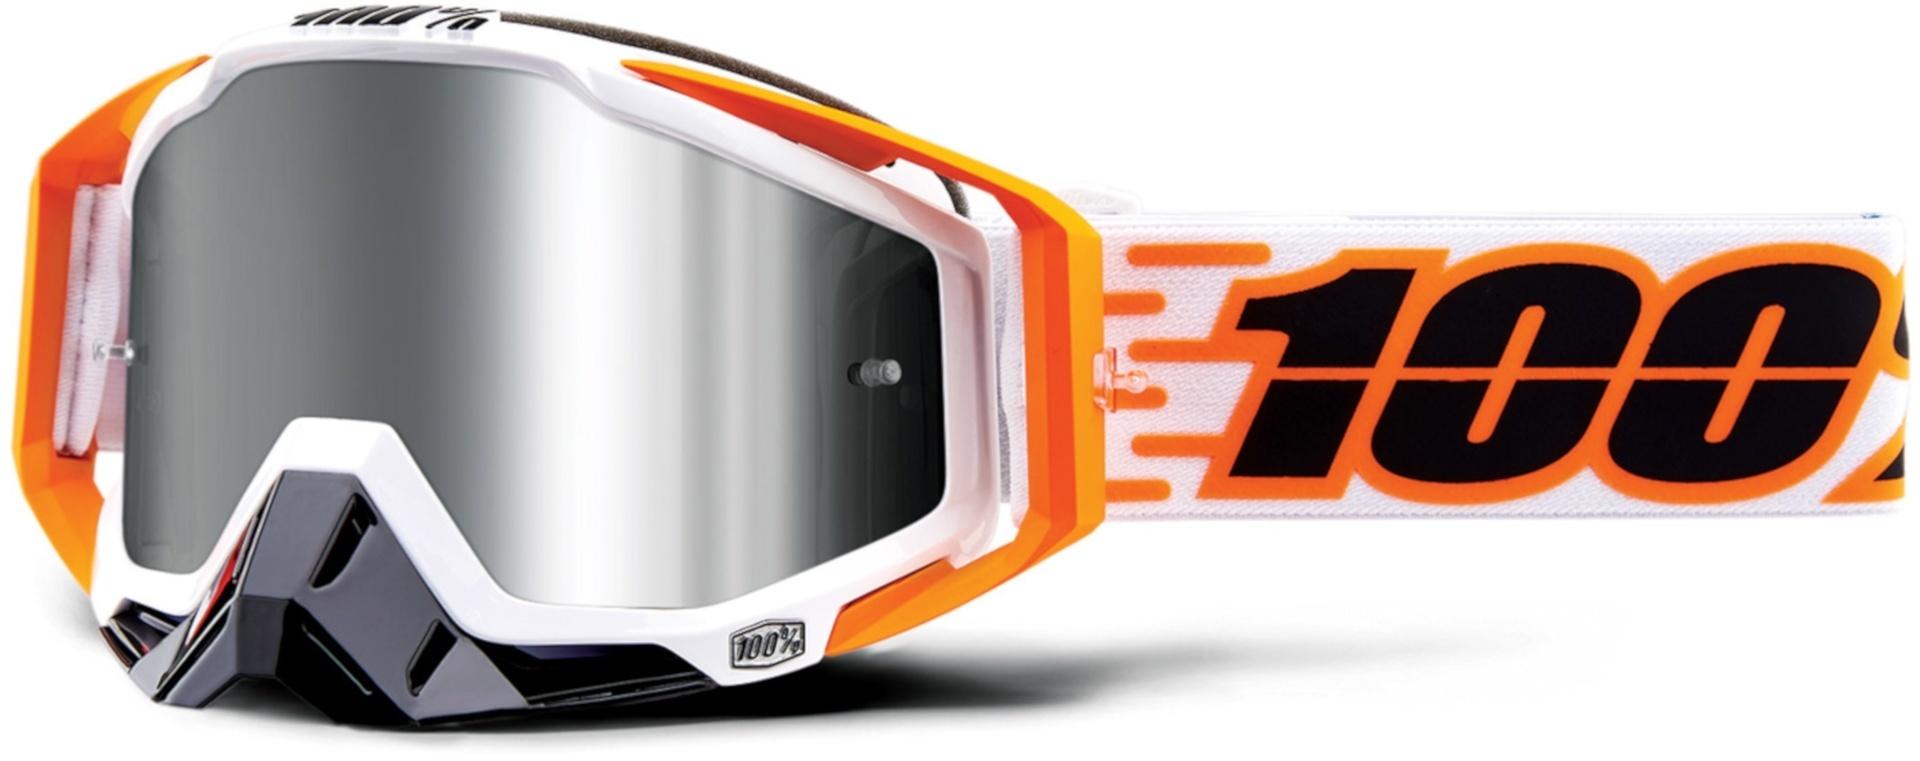 100% Racecraft Plus Illumina Motocross Brille, weiss-orange, weiss-orange RC Modellbau